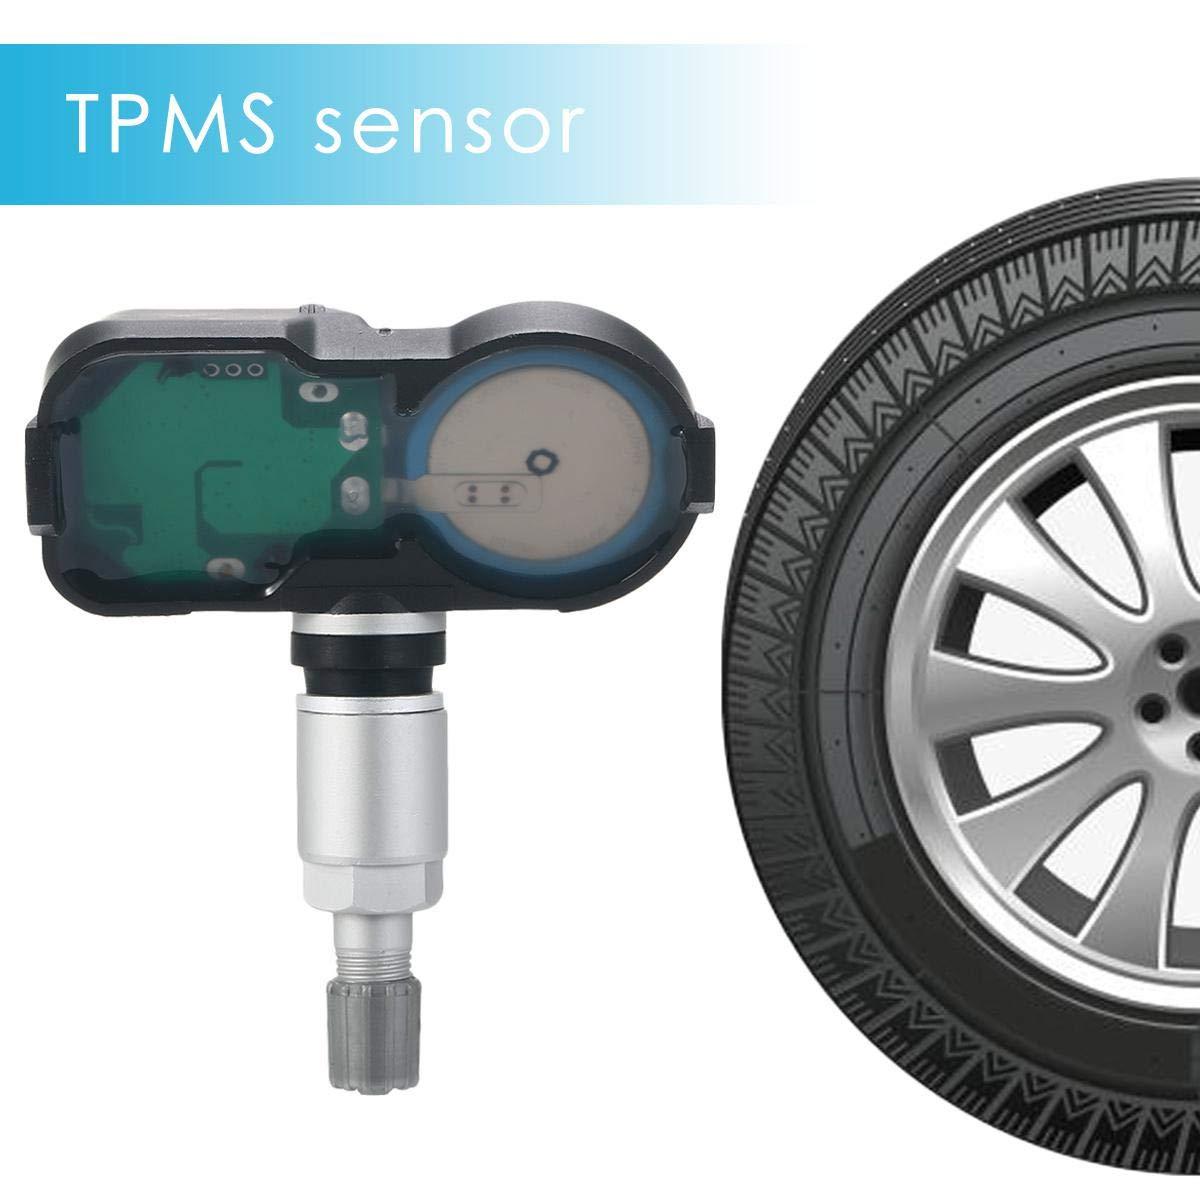 42607-33021 Dokfin Sensor De Presi/ón De Neum/áticos TPMS Reemplazo para Algunos Modelos Lexus 315 MHz Toyota